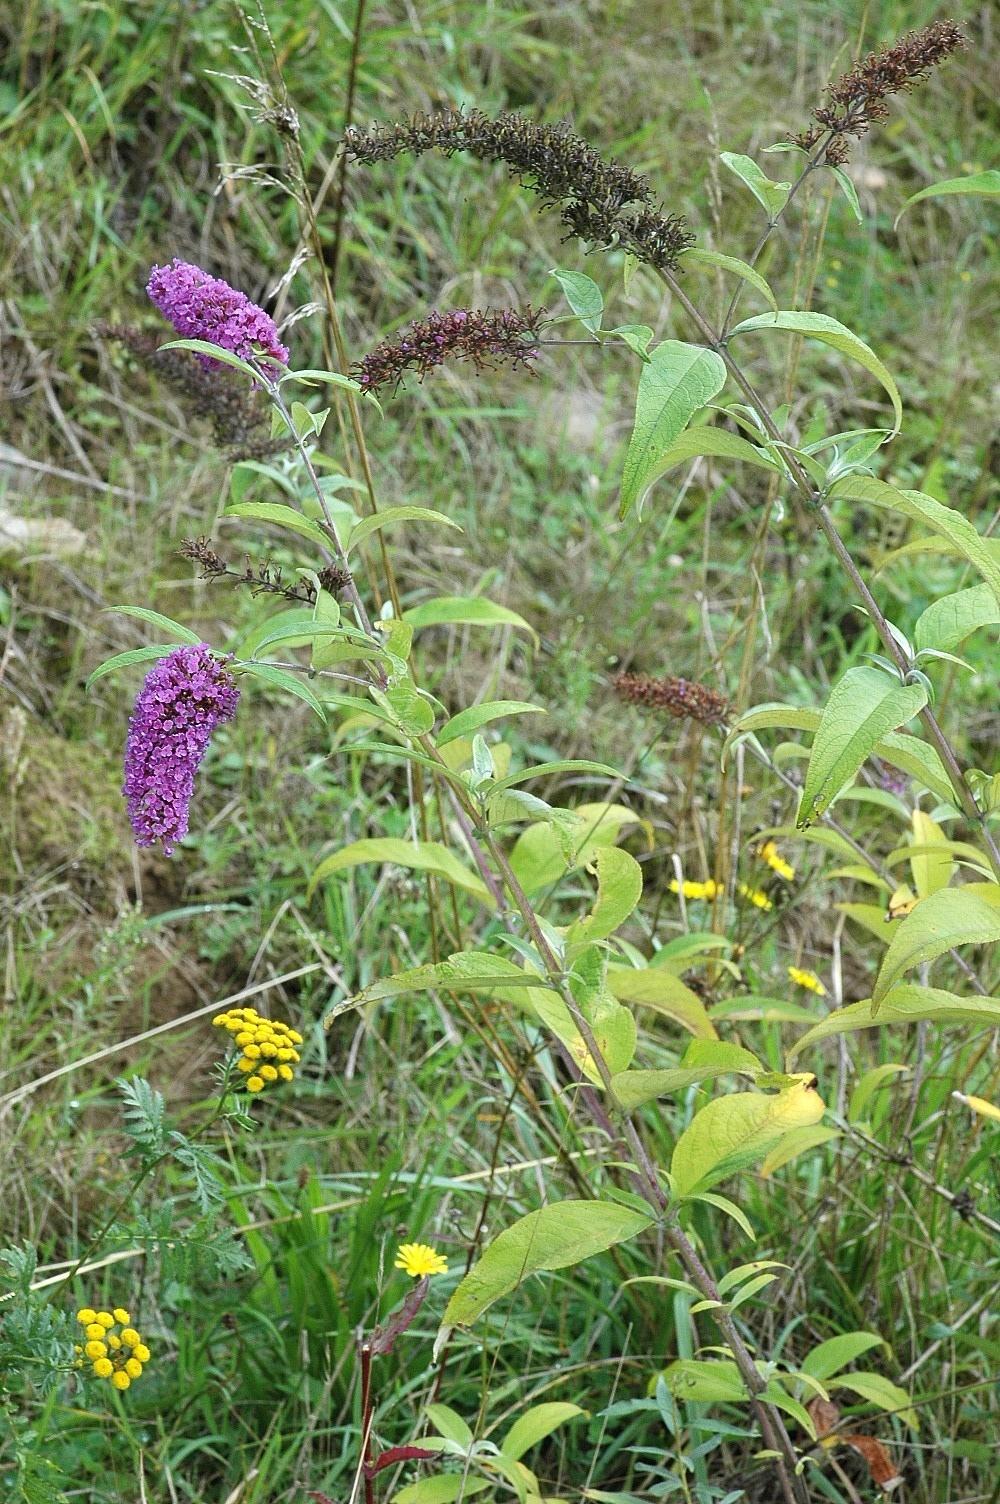 Image of Butterfly bush